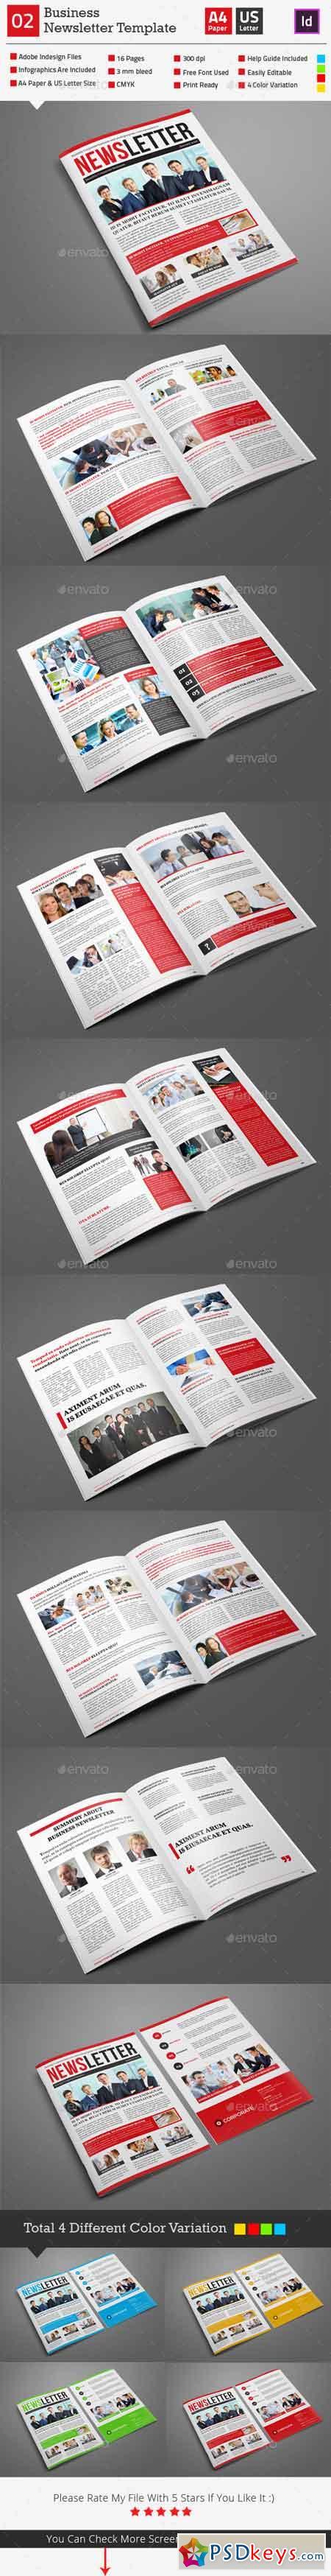 Newsletter Template 02 9724427